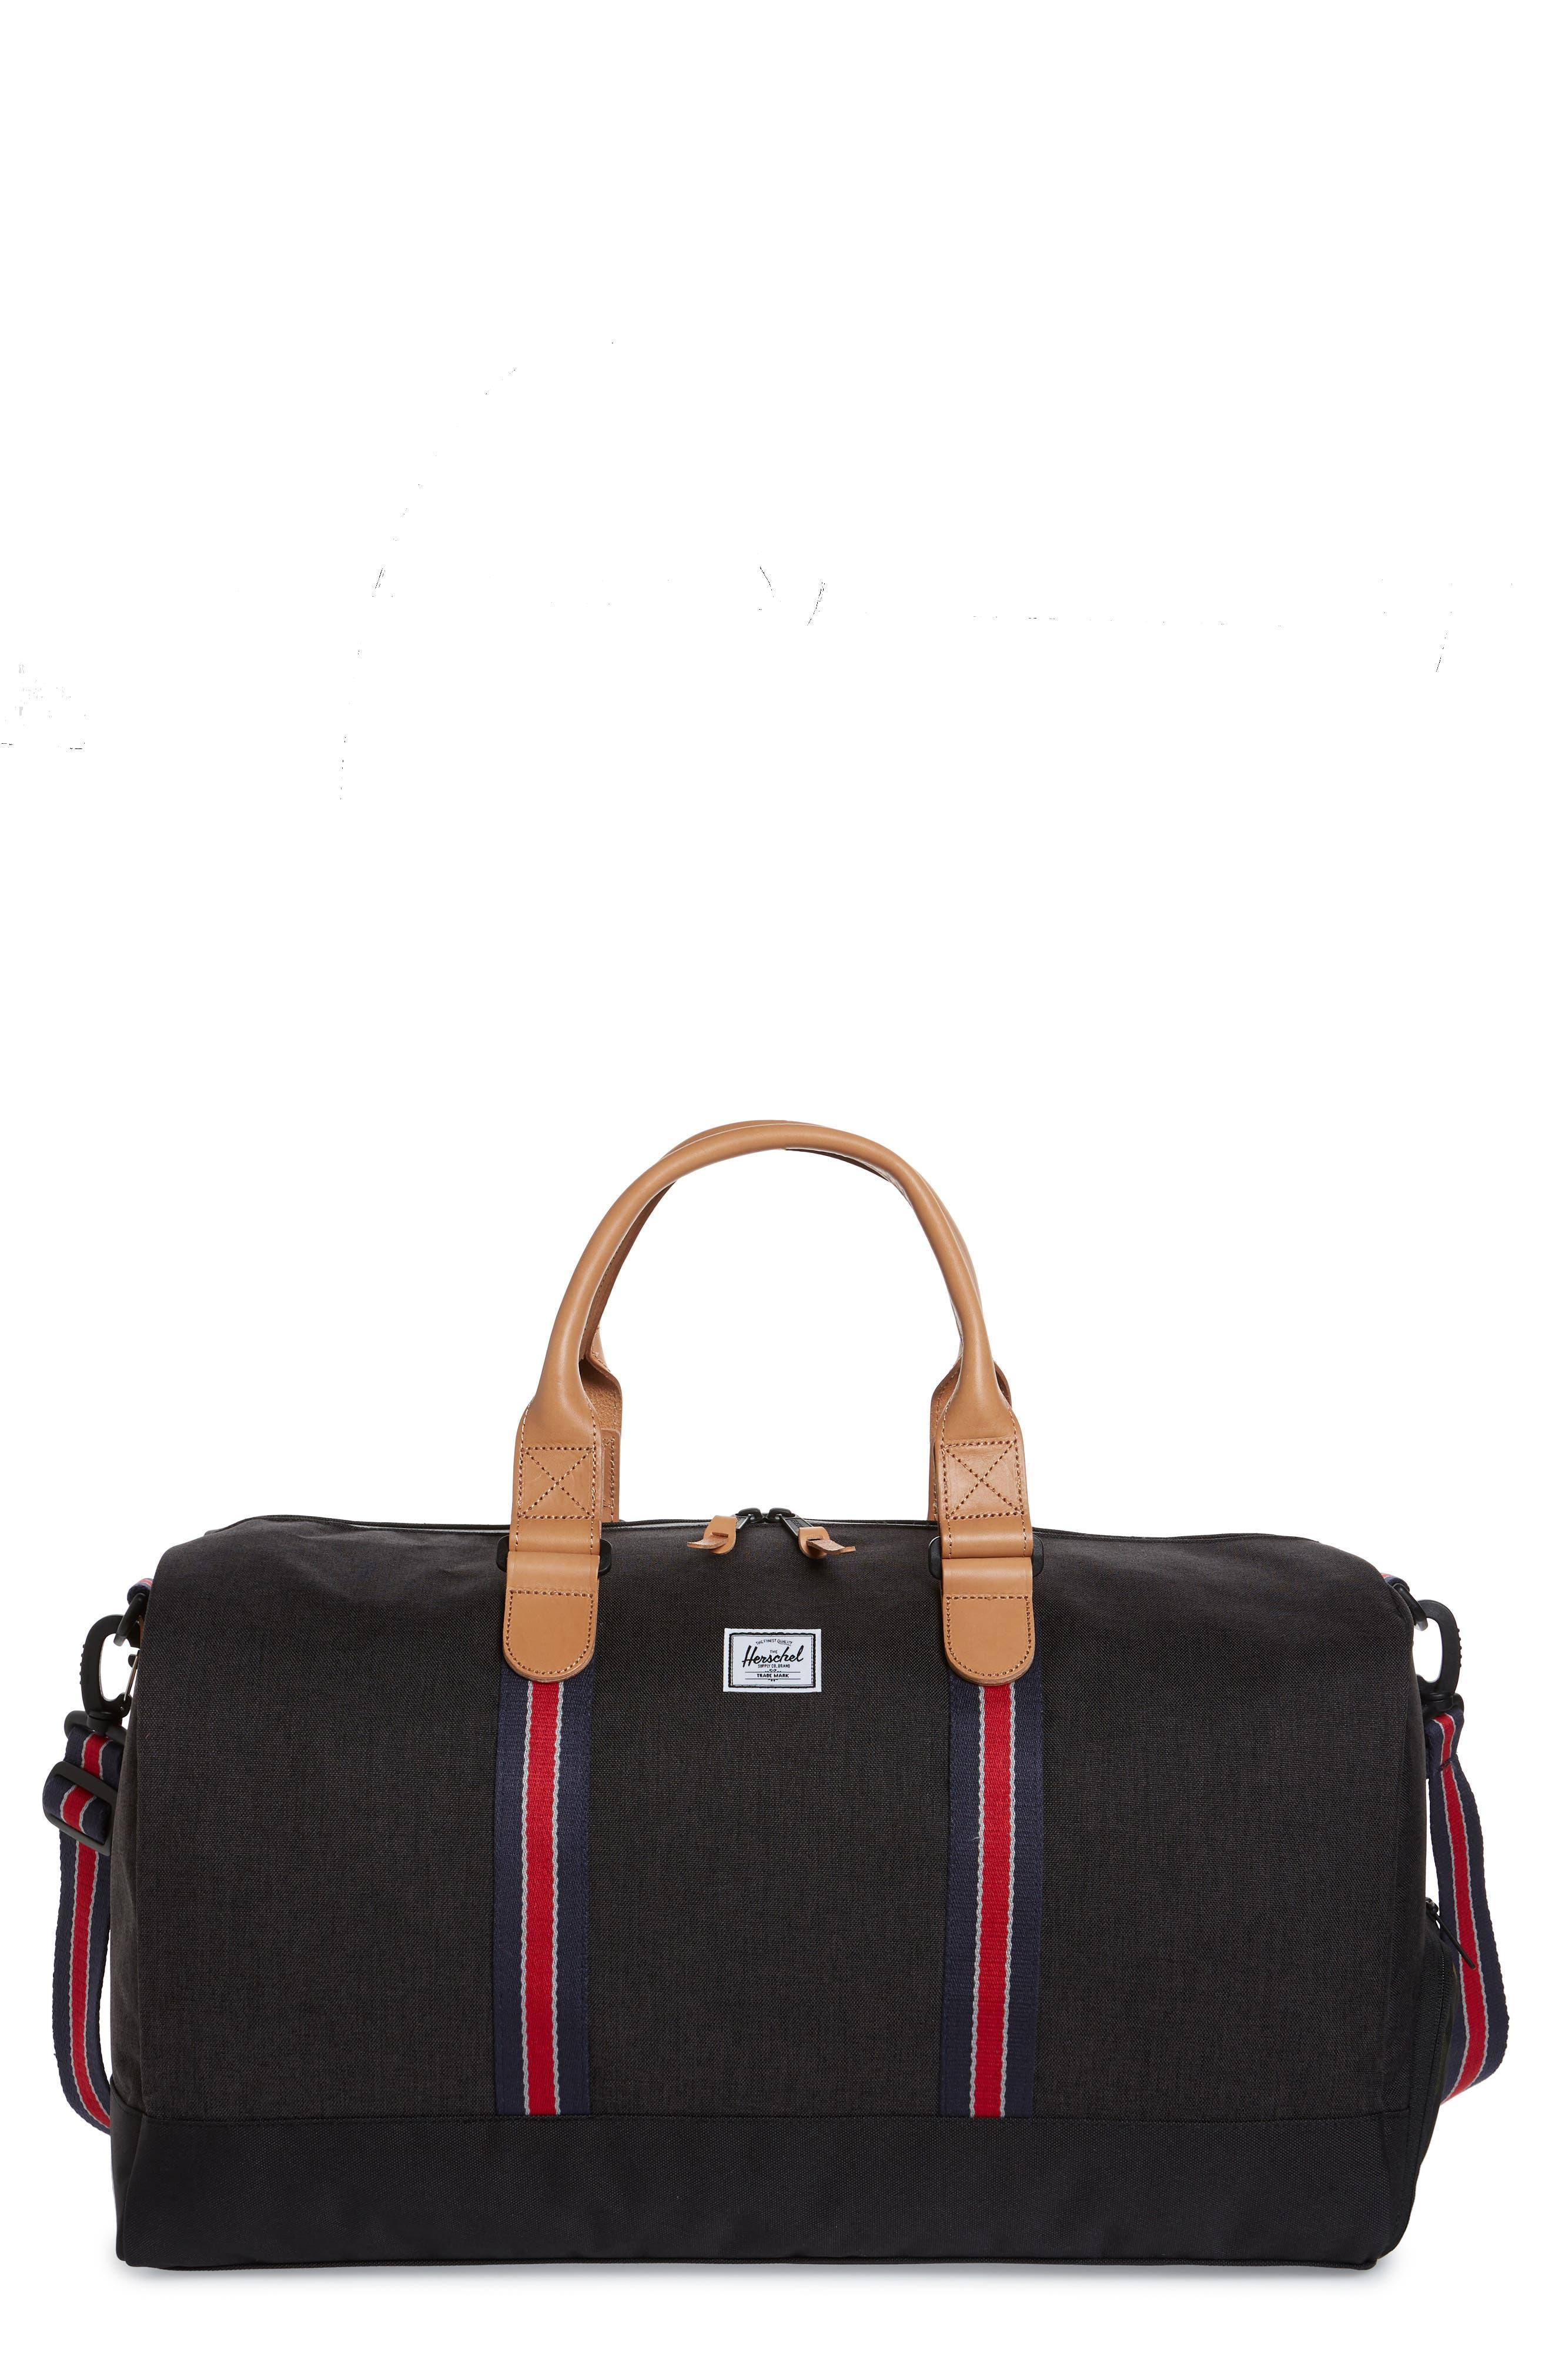 HERSCHEL SUPPLY CO. Novel Duffle Bag, Main, color, BLACK CAMO OFFSET